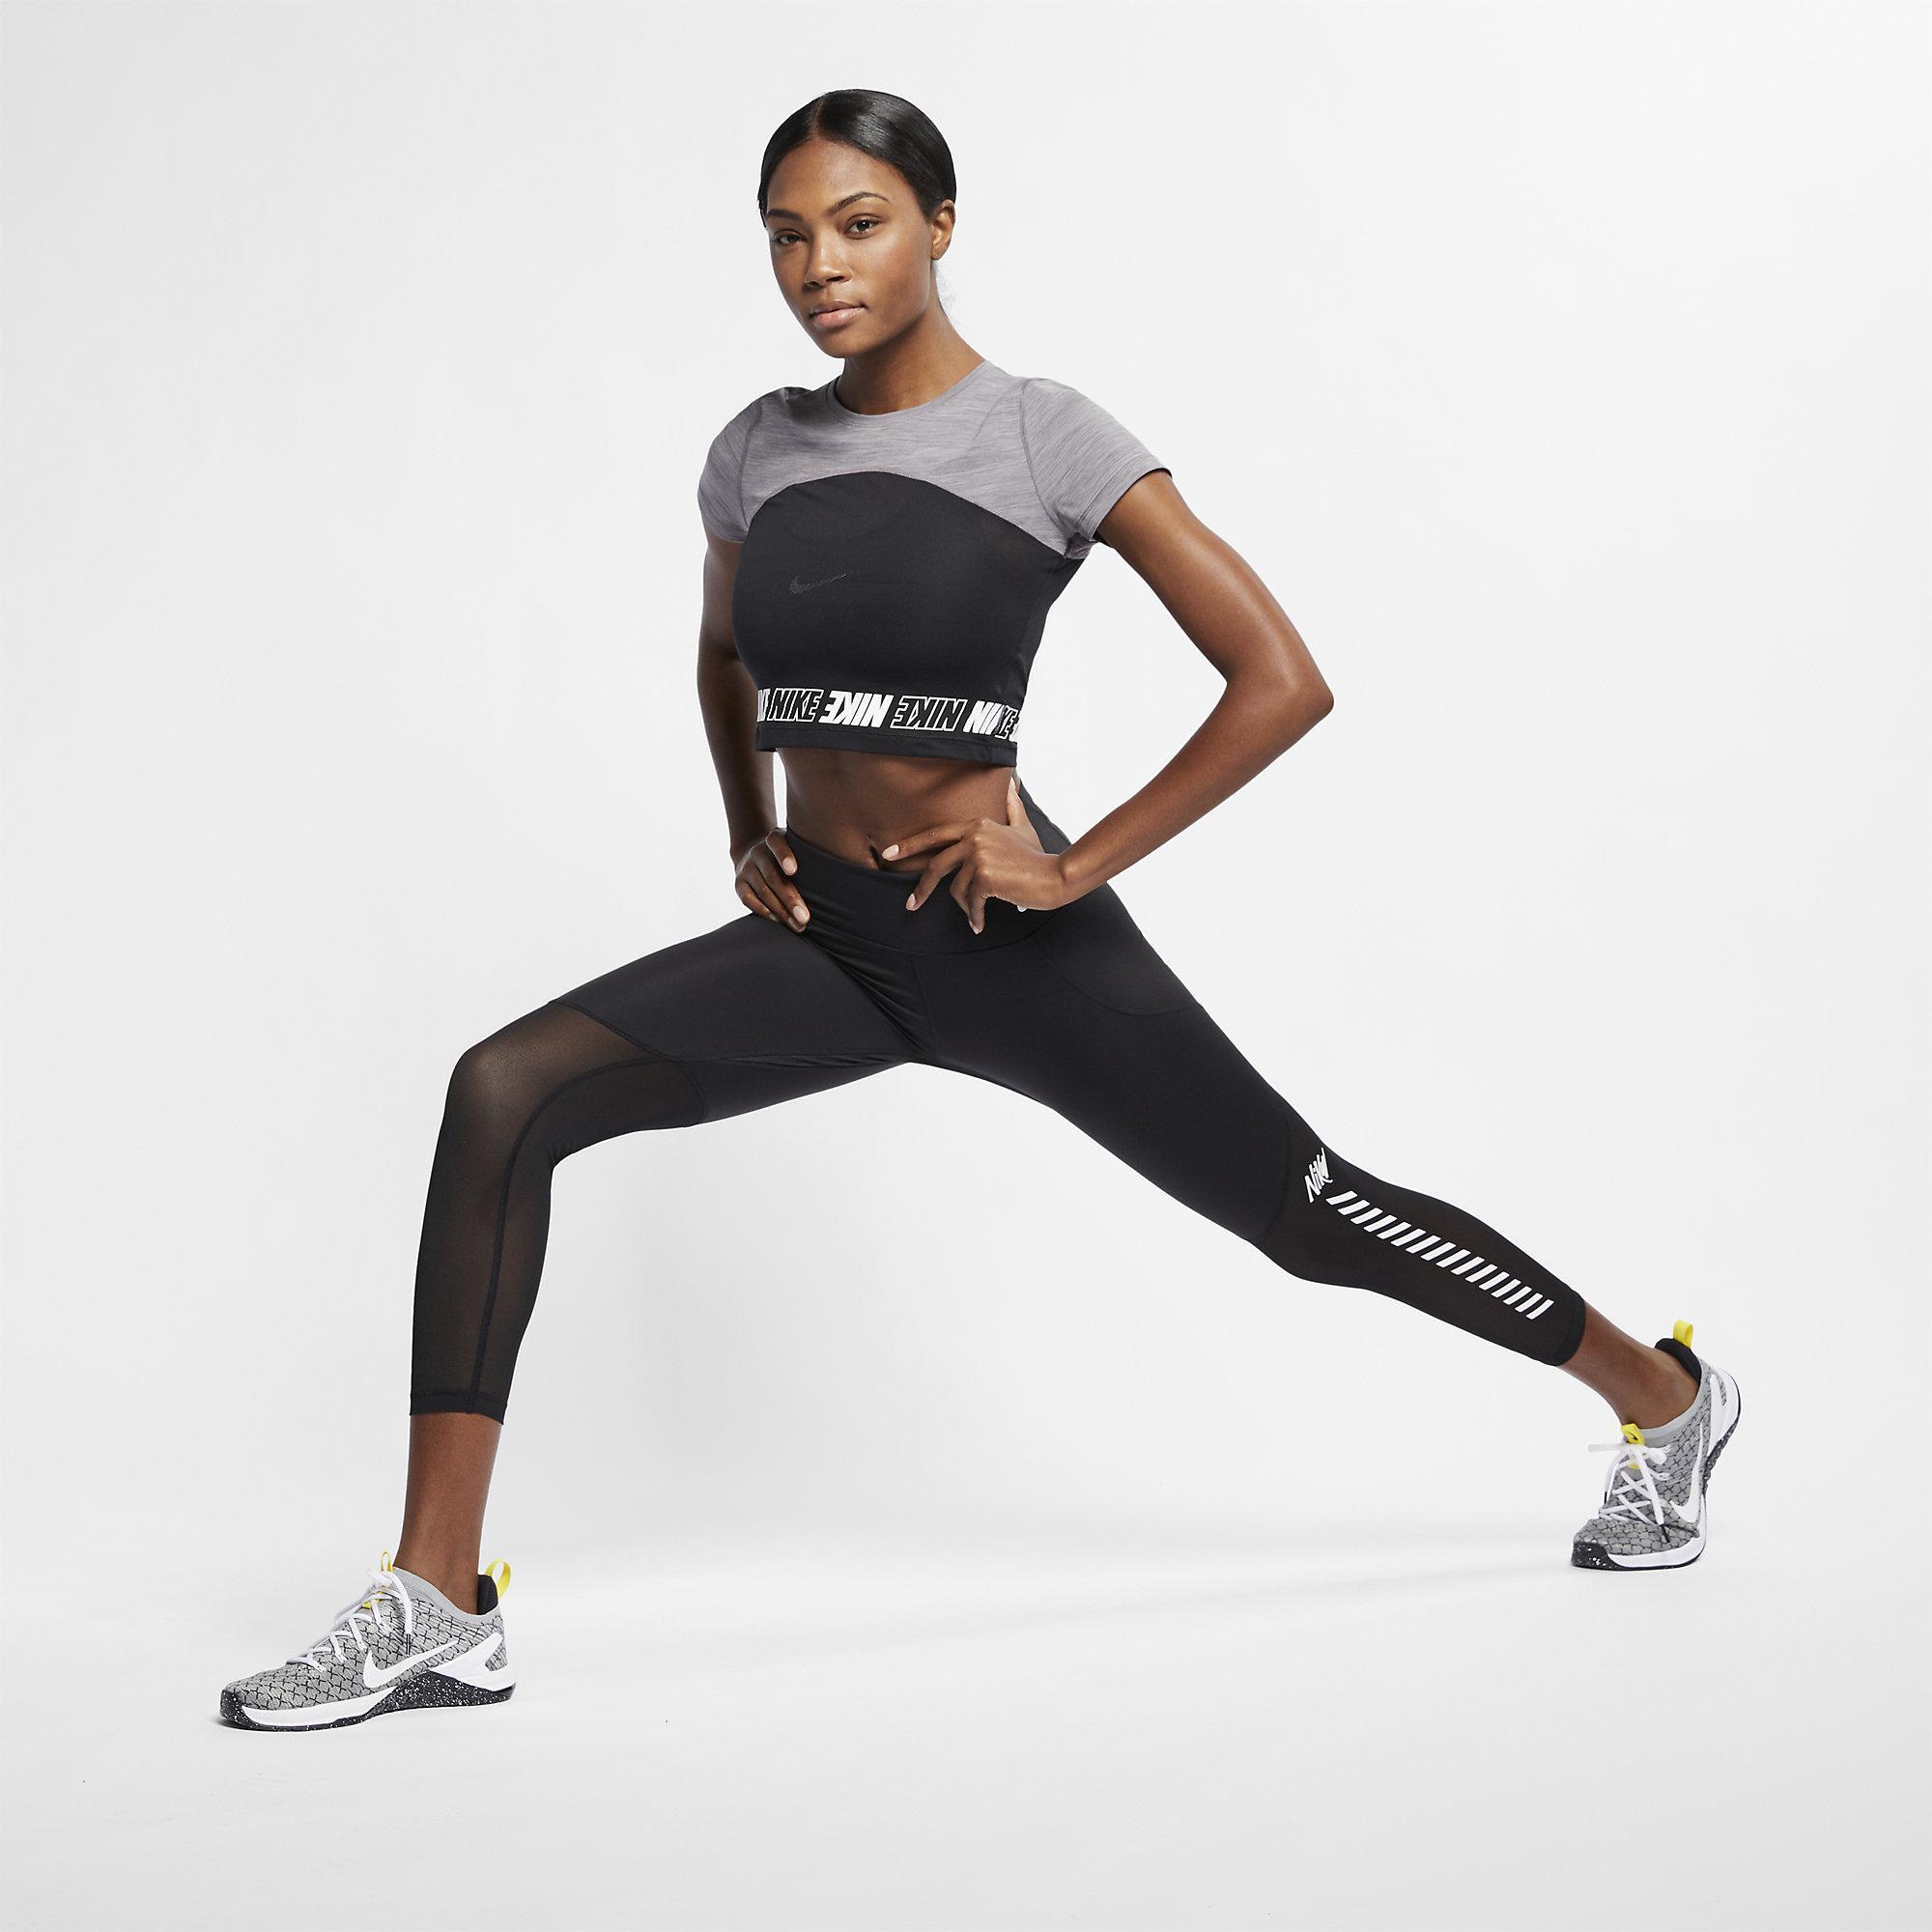 a52627342f039b Nike Womens Pro Short-Sleeve Crop Top- Gunsmoke Heather White ...